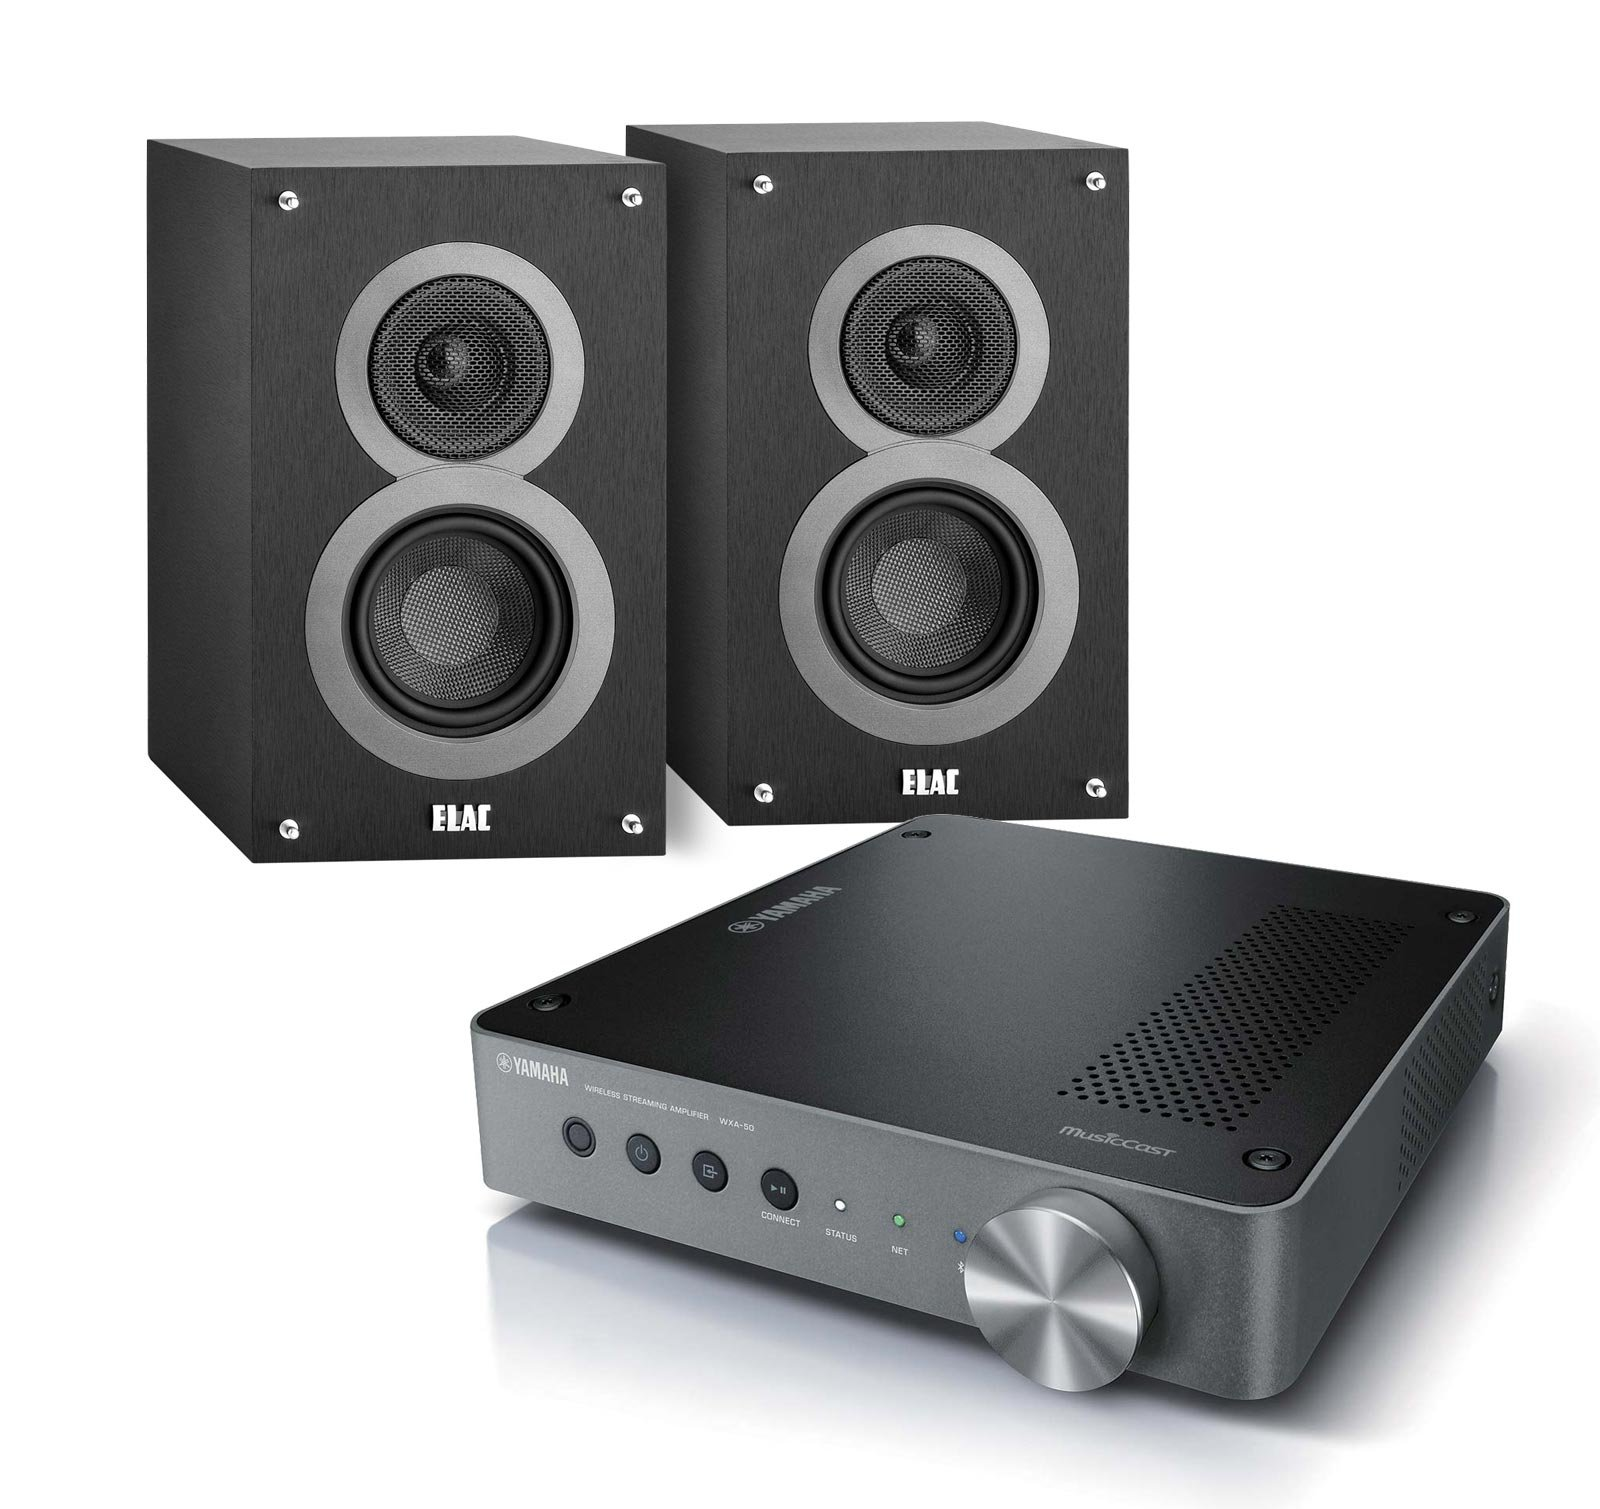 Yamaha MusicCast WXA-50 Audio Component Amplifier (Dark Silver) with ELAC Debut B4 2-Way Bookshelf Speakers, Pair (Black)